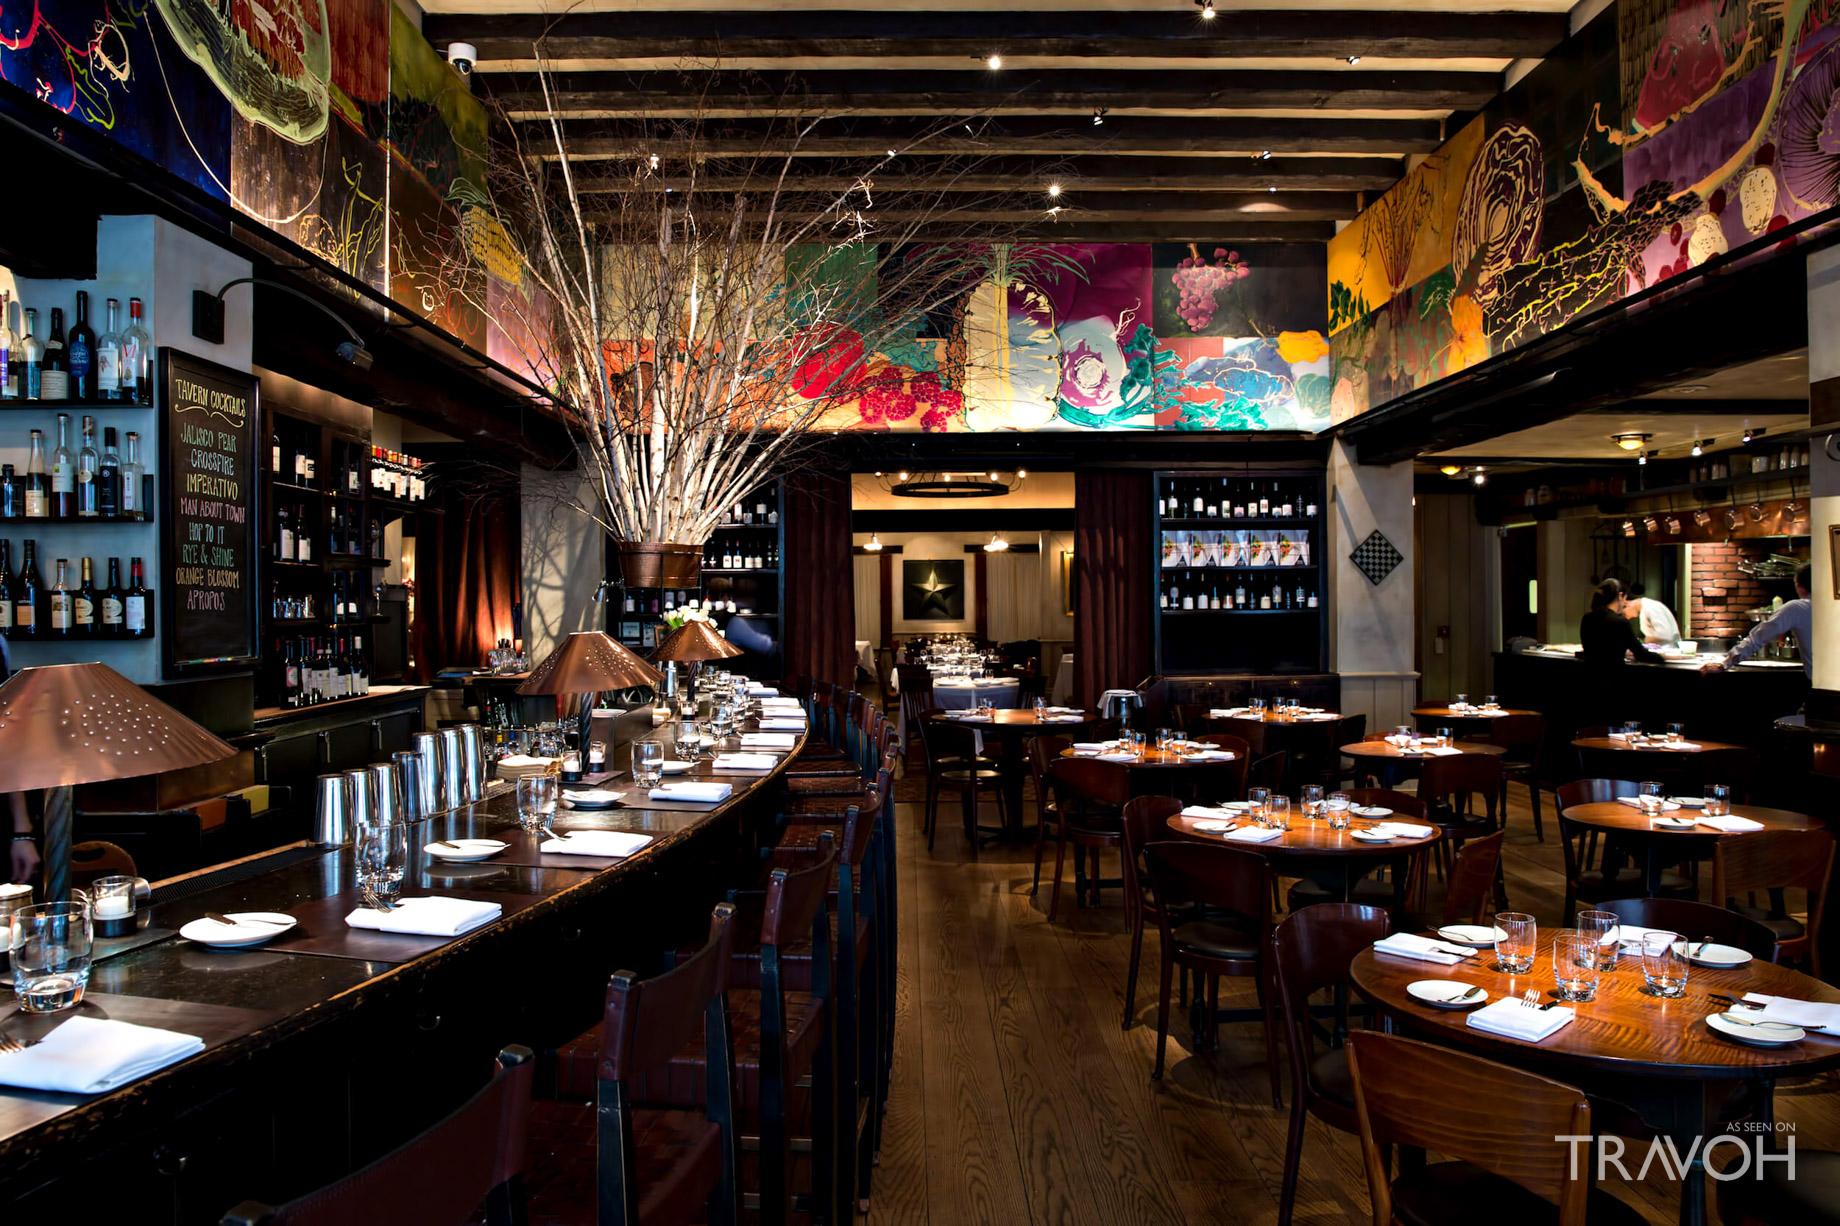 Gramercy Tavern Restaurant - 42 E 20th St, New York, NY 10003, USA